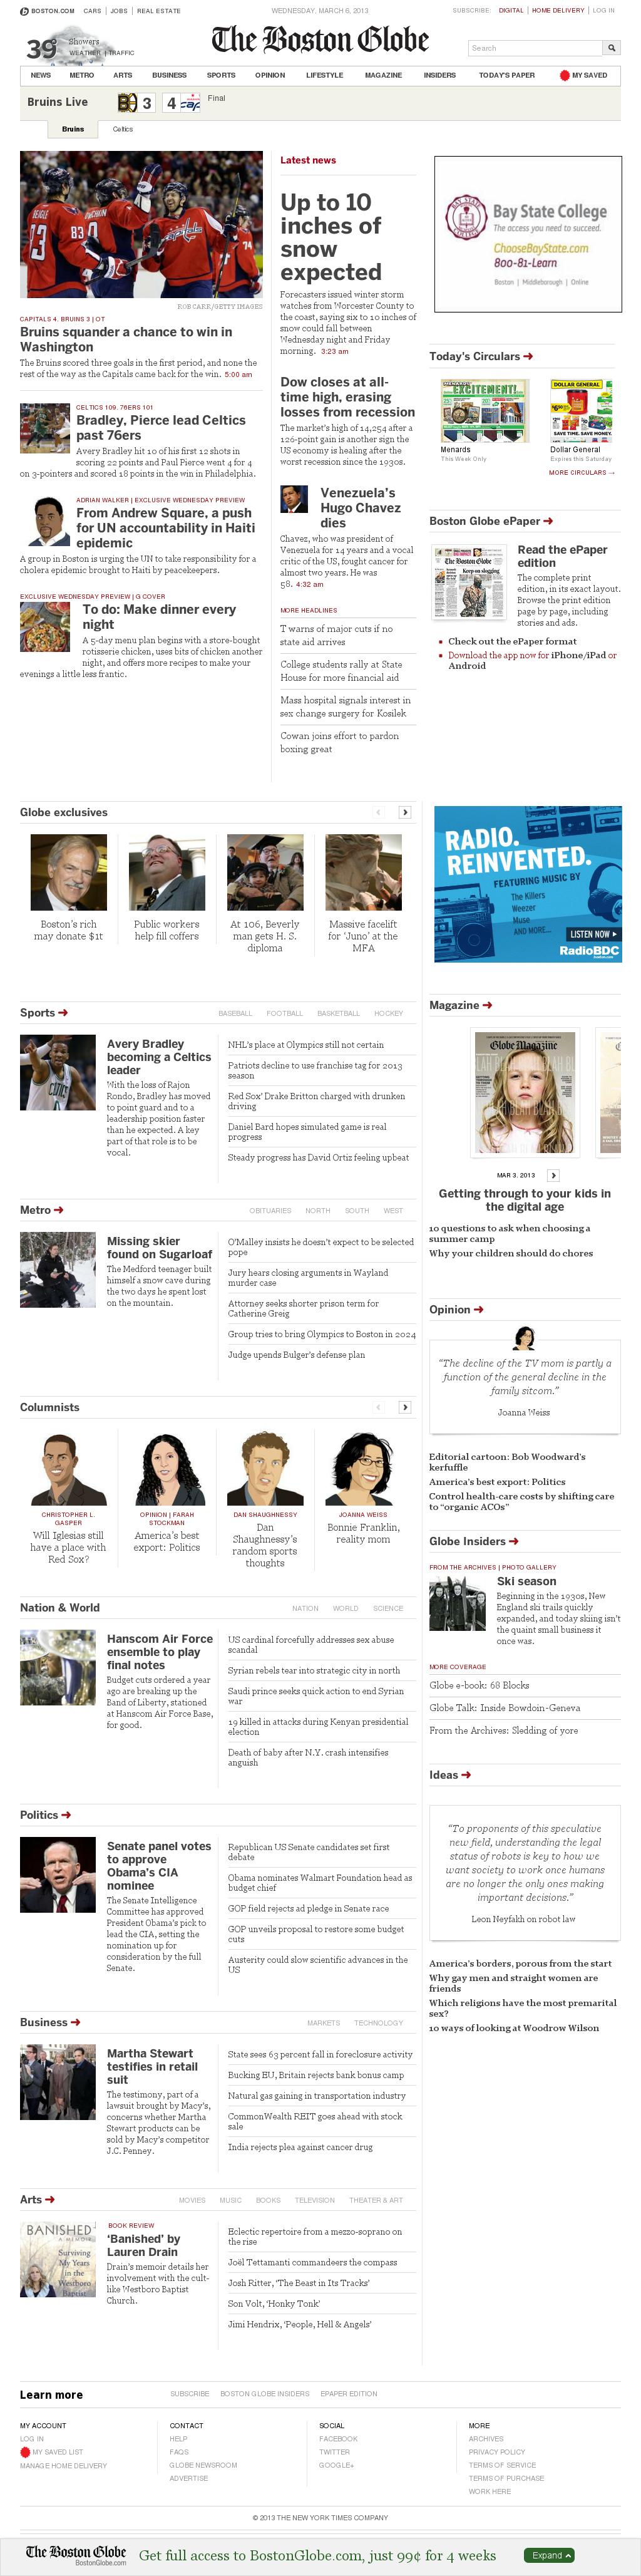 The Boston Globe at Wednesday March 6, 2013, 6:02 a.m. UTC